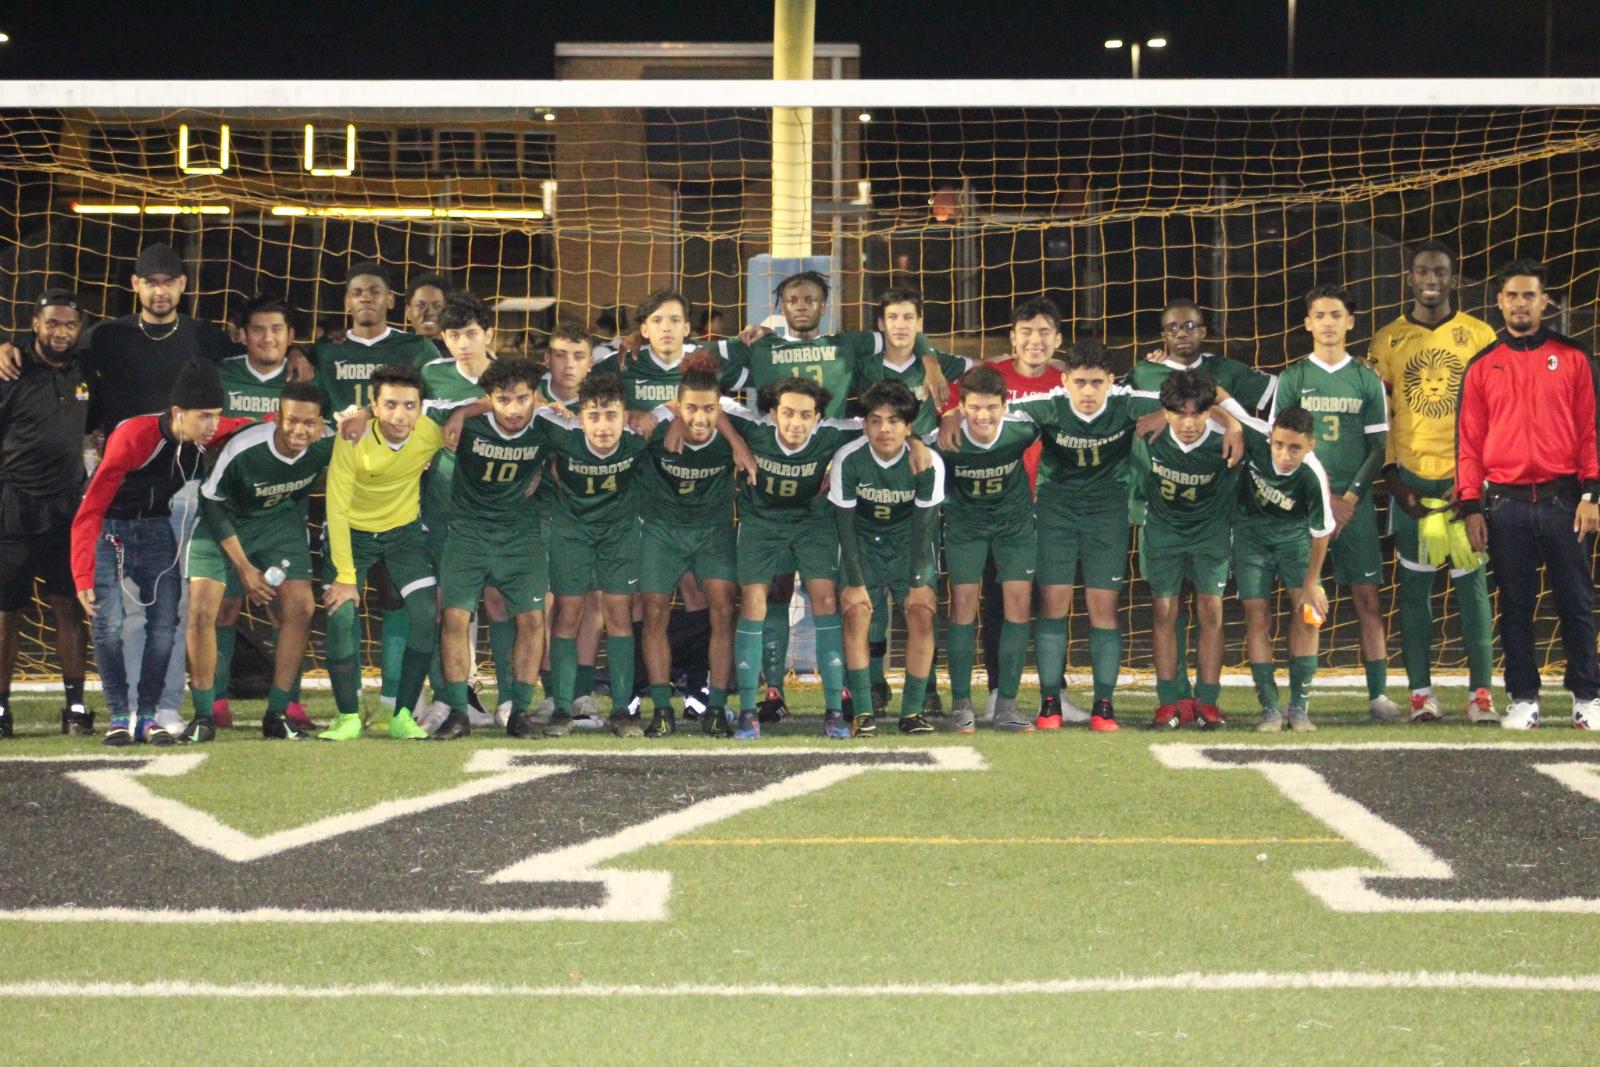 Tight-Knit Morrow Boys Soccer Team Posted Successful 2020 Season